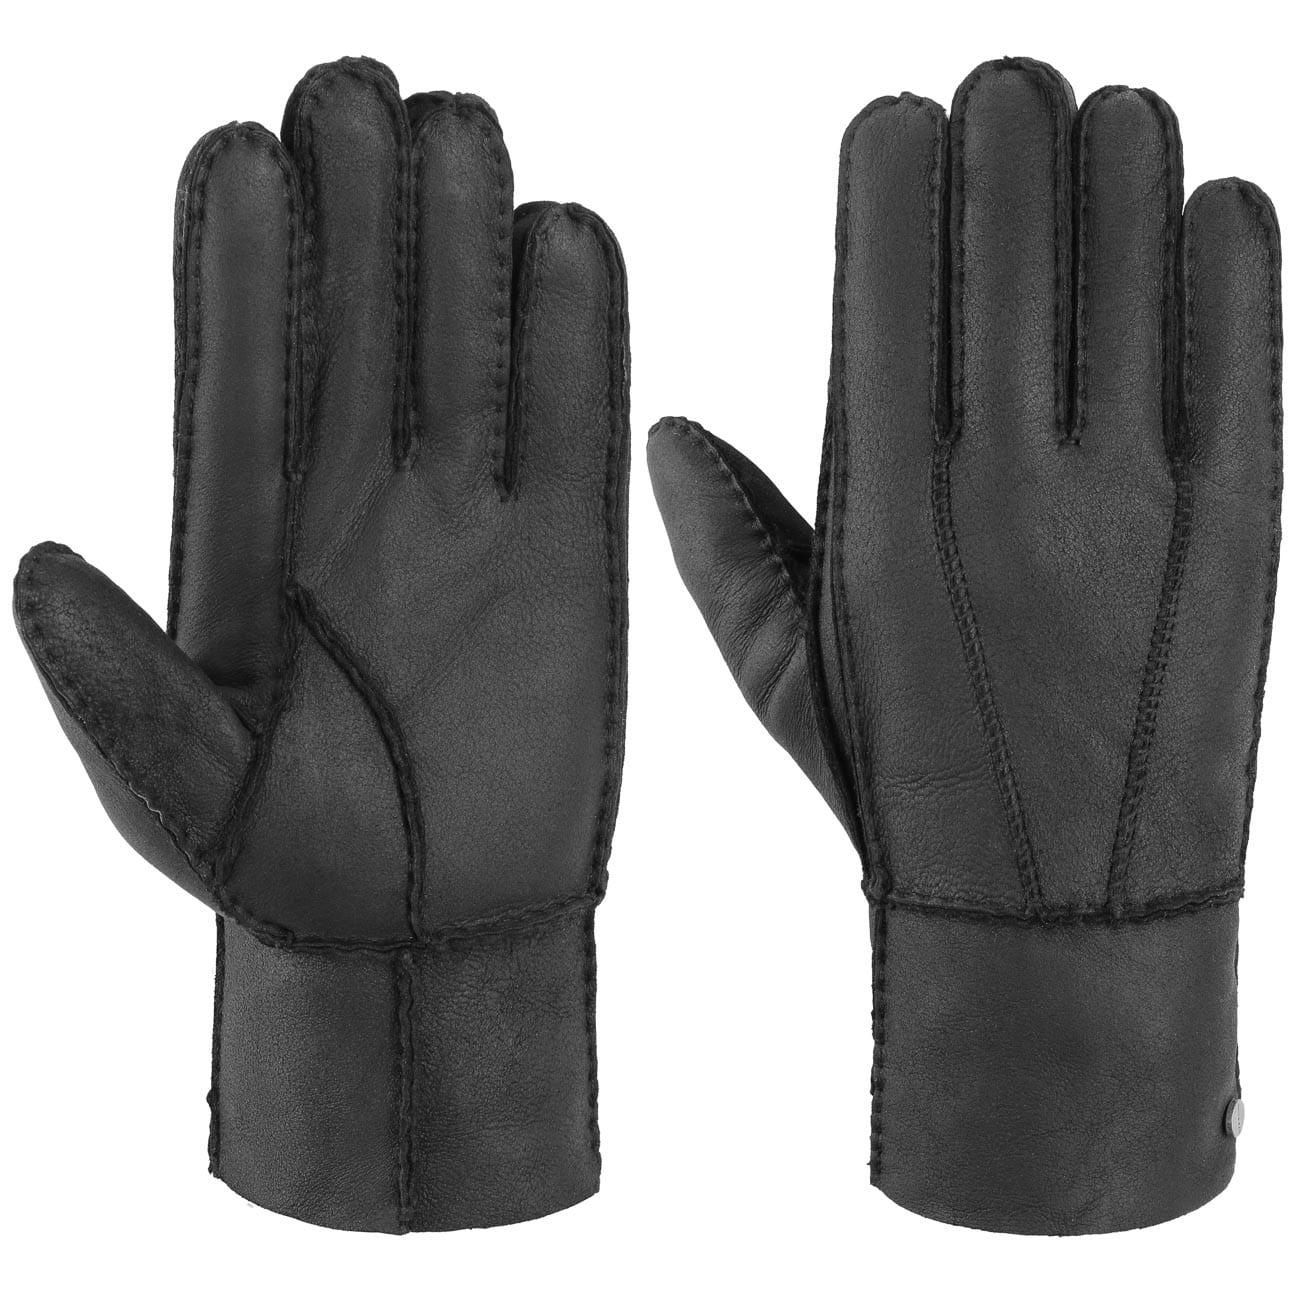 tarlington-lederhandschuhe-by-stetson-fingerhandschuhe